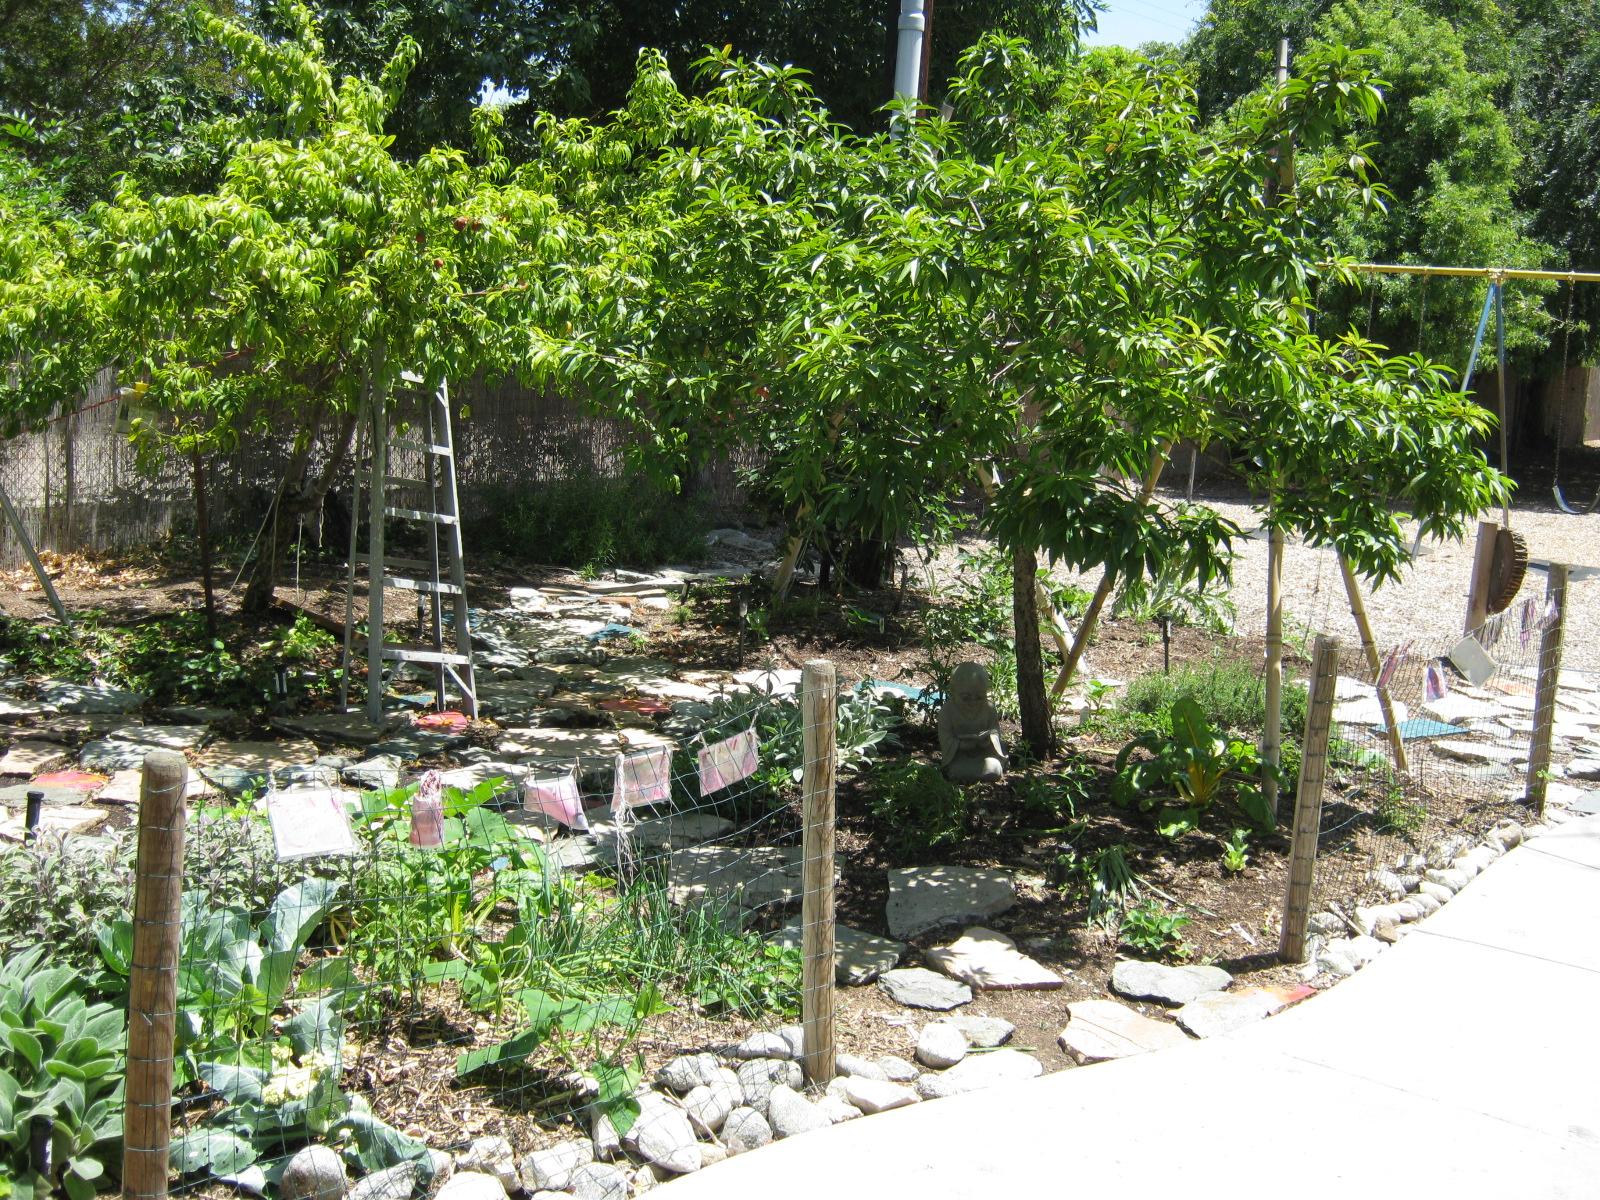 The garden at Barnhart School